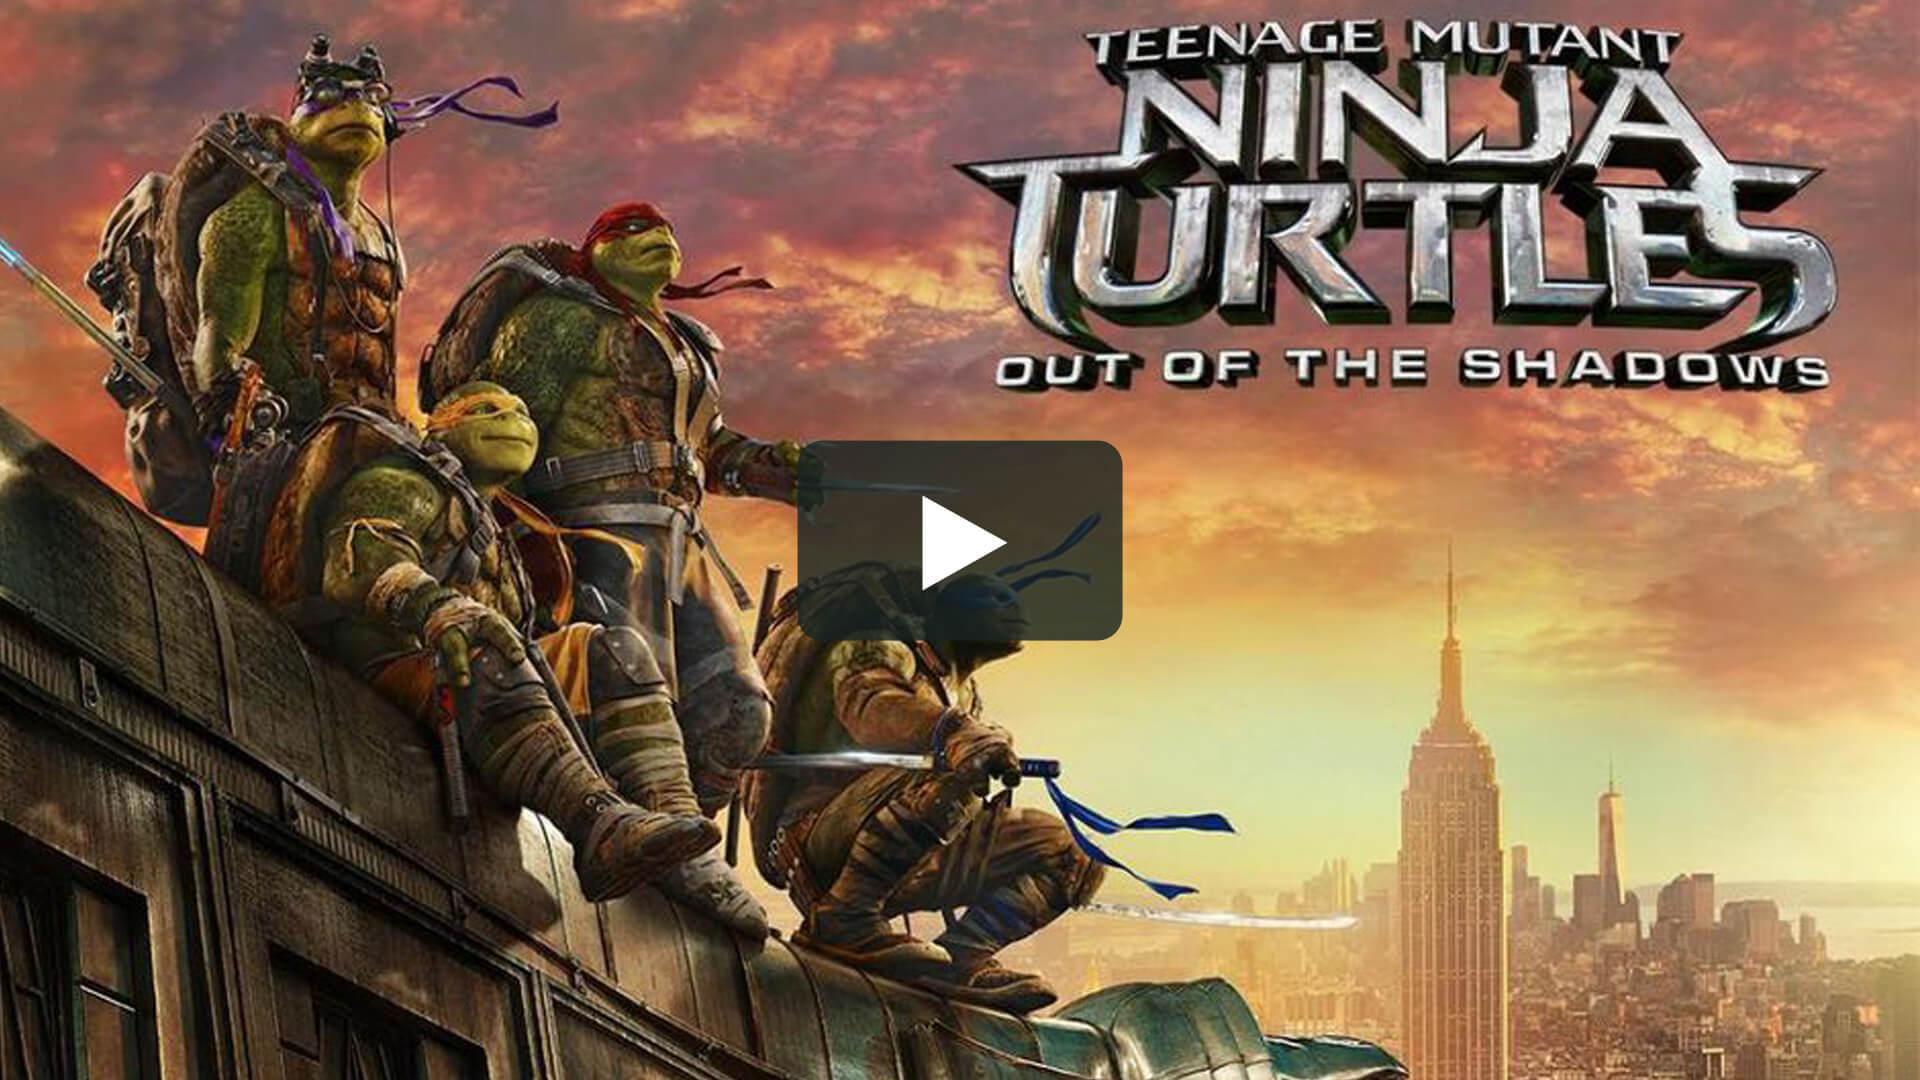 Teenage Mutant Ninja Turtles: Out of the Shadows - 忍者神龜2:破影而出